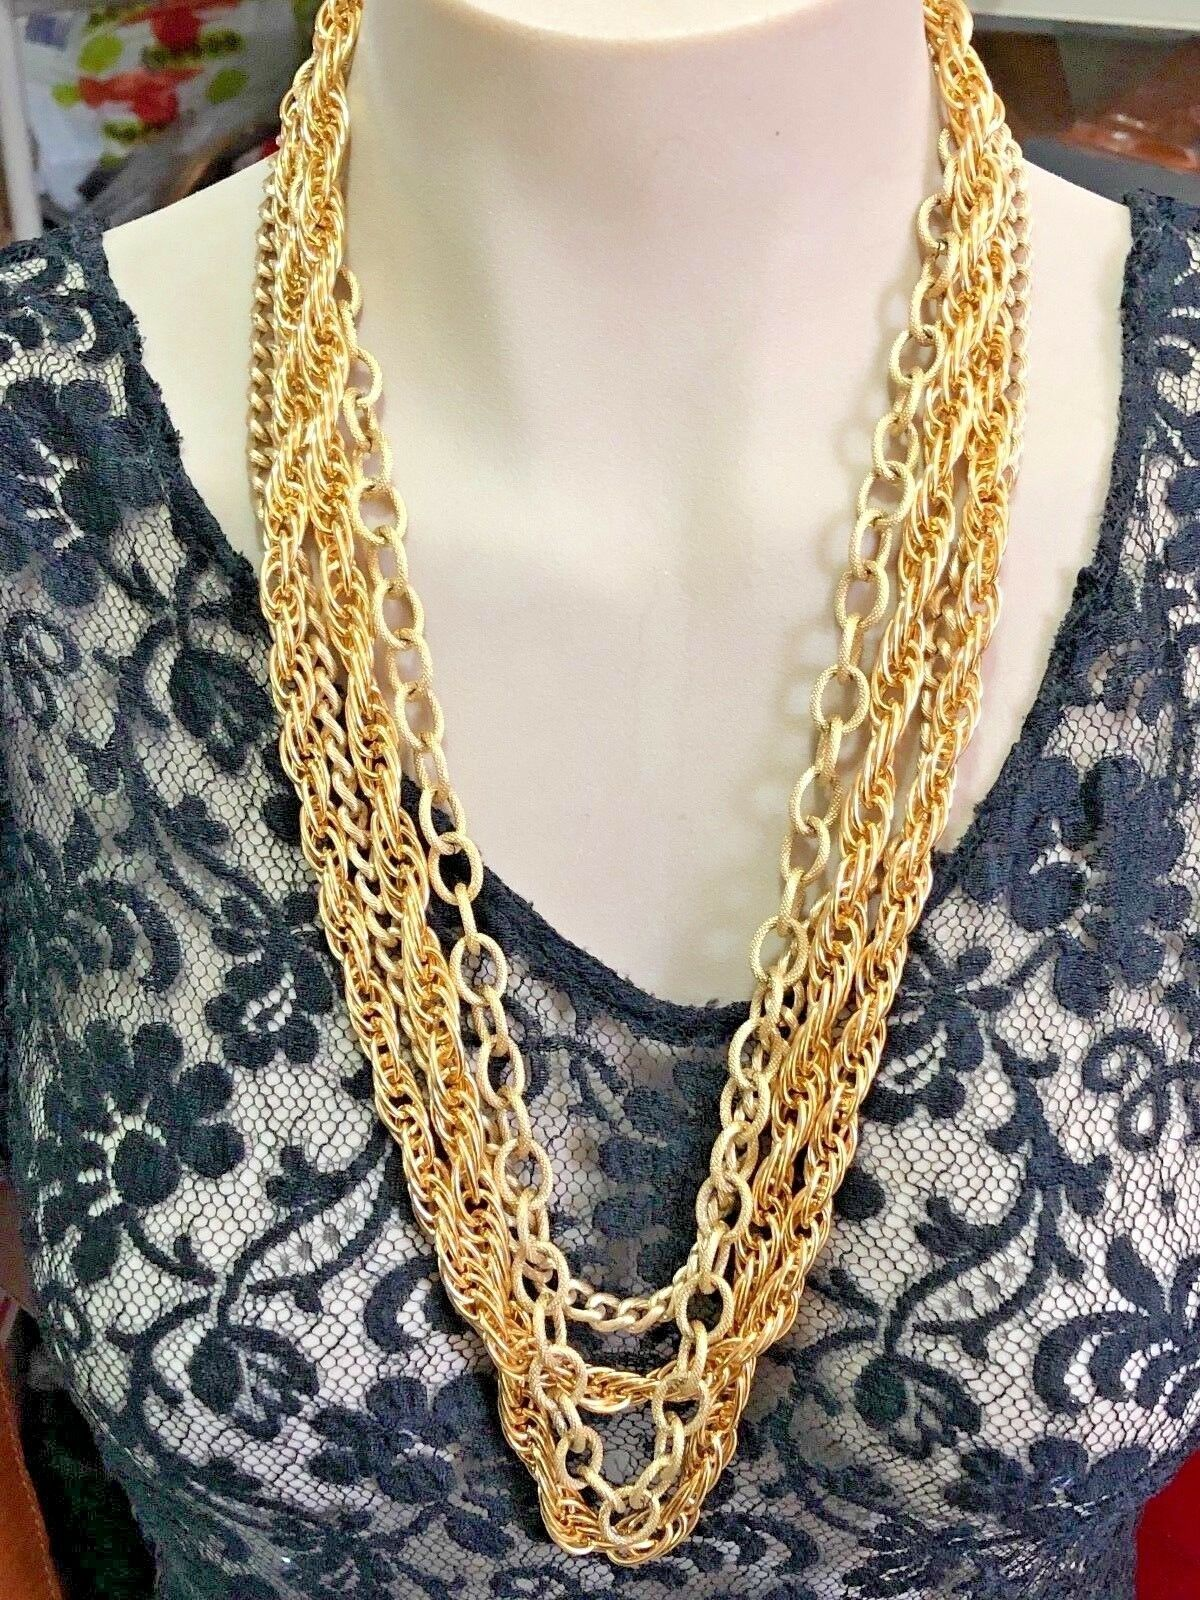 1960's Signed Vintage Gold Tone Multi Strand Necklace - Signed O.S